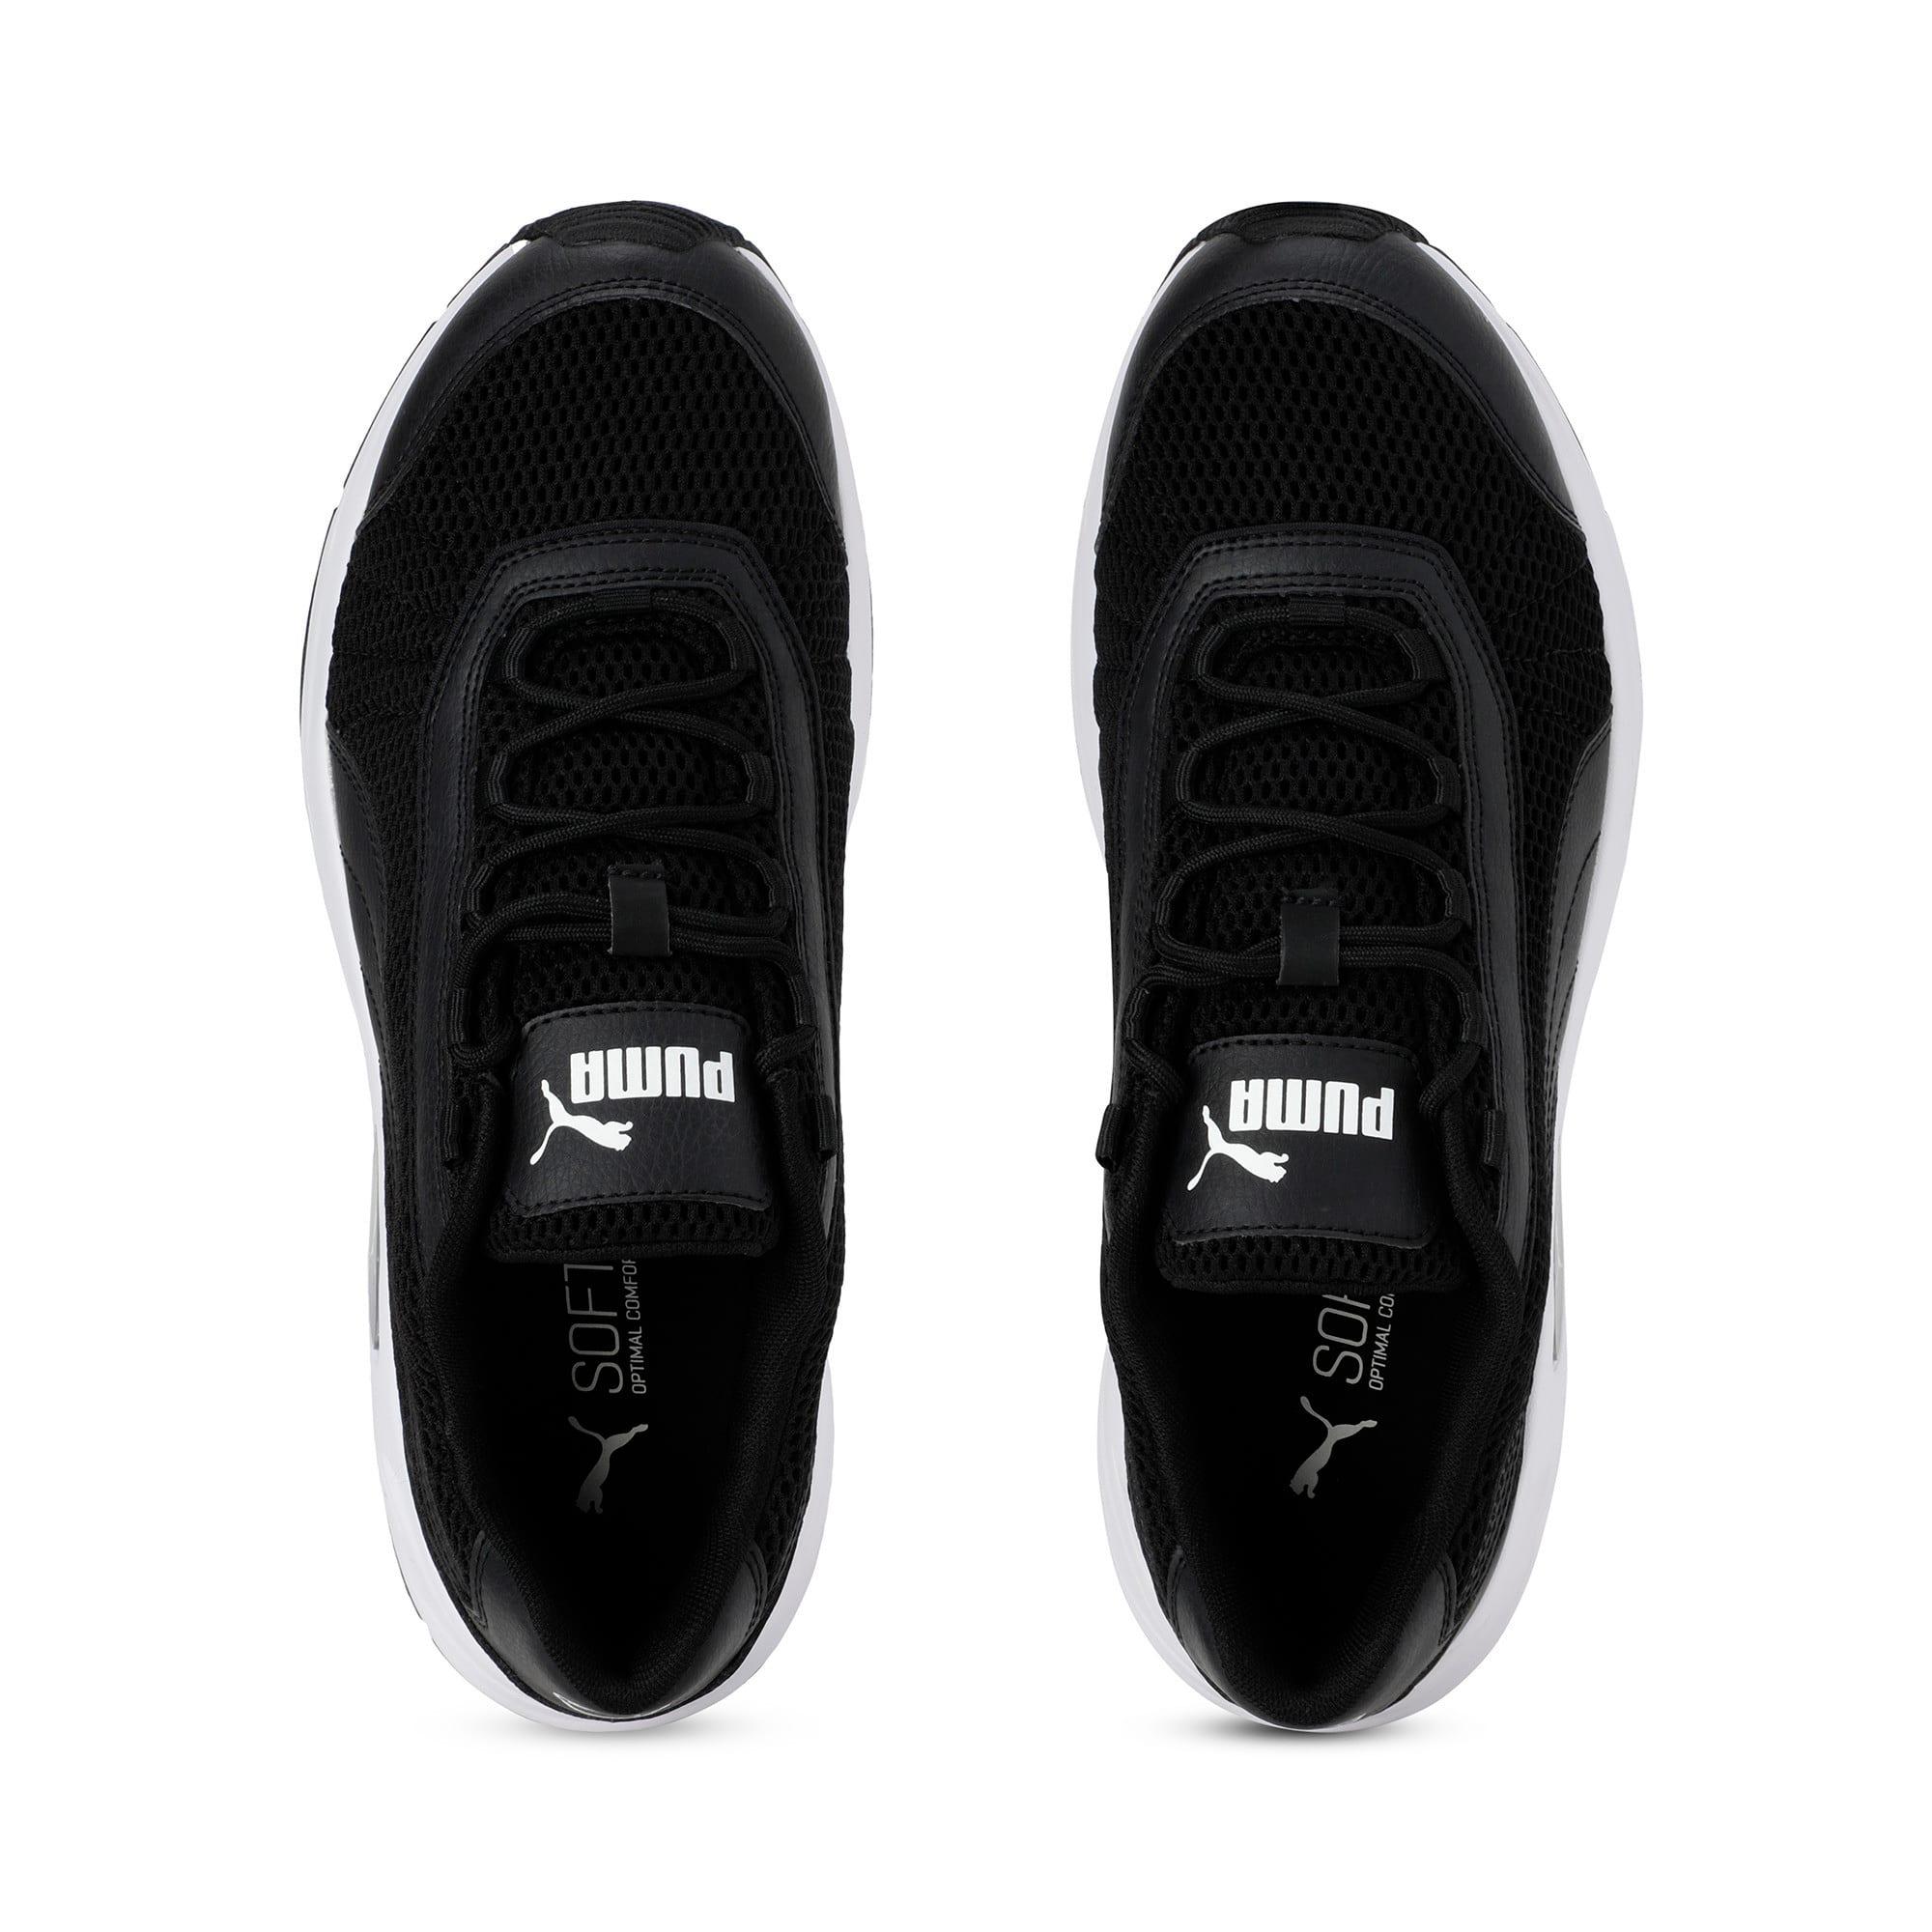 Thumbnail 8 of Nucleus Training Shoes, Puma Black-Puma Black, medium-IND